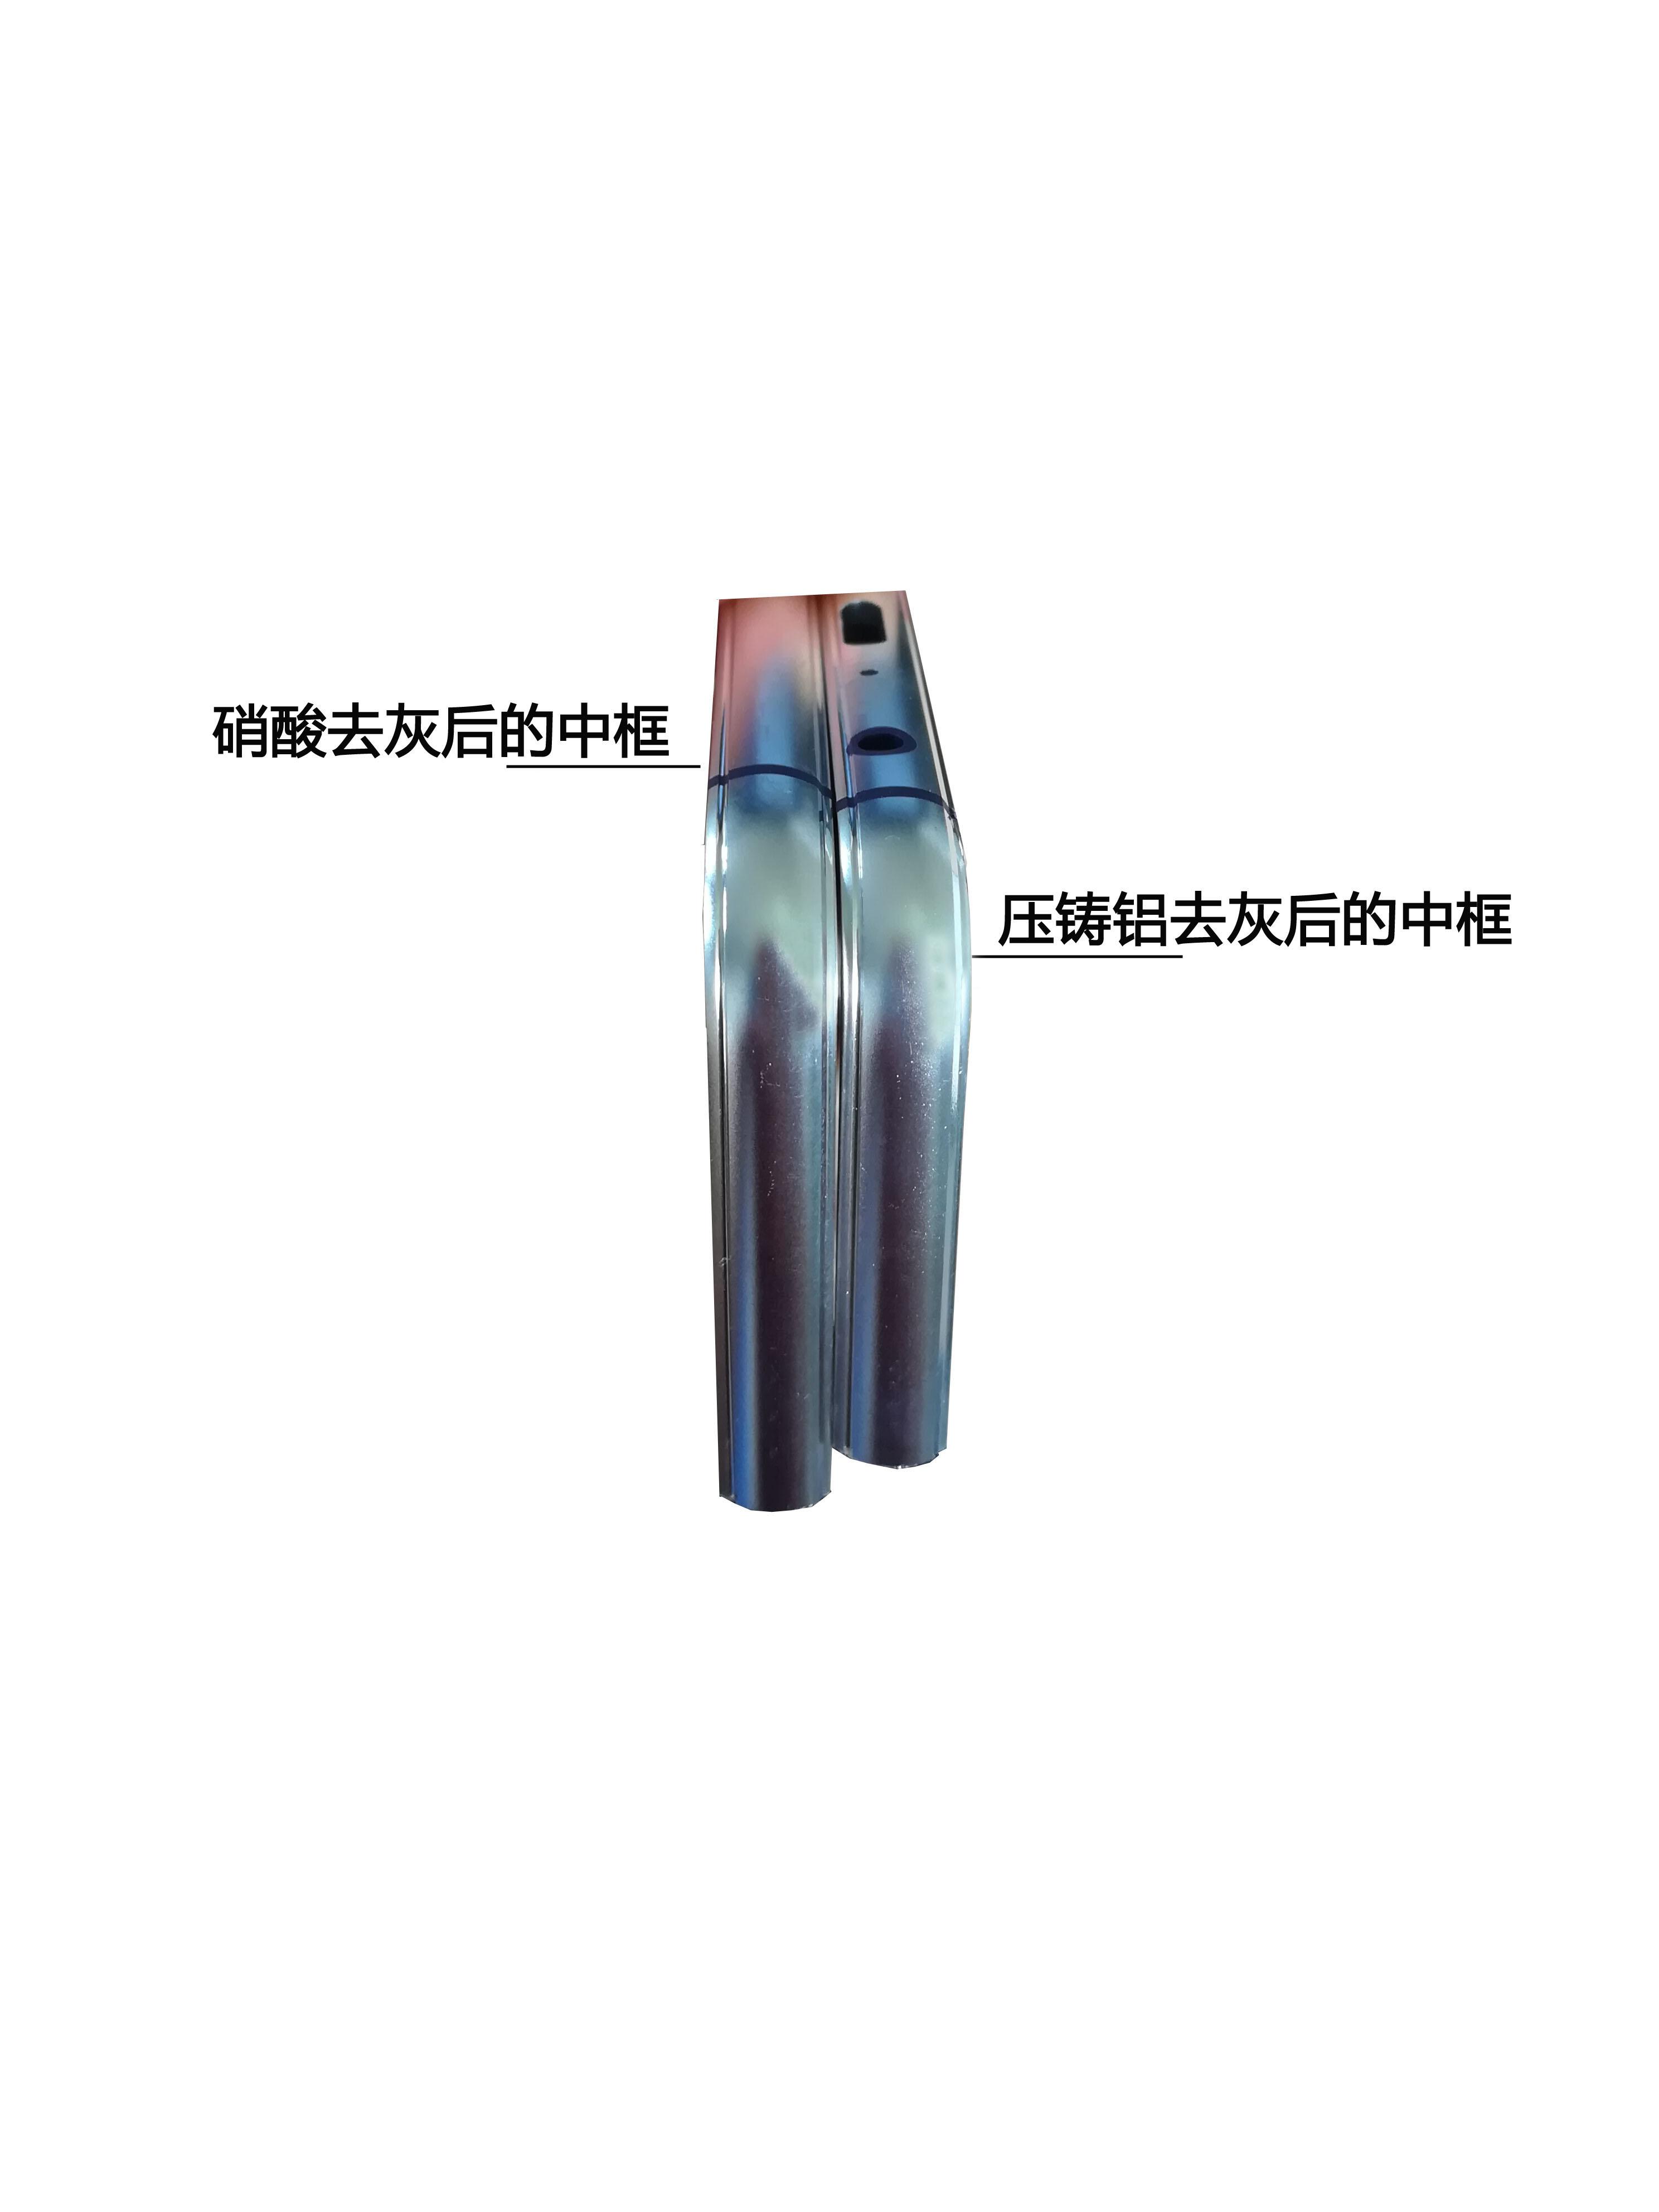 SF–532壓鑄鋁合金環保去灰劑